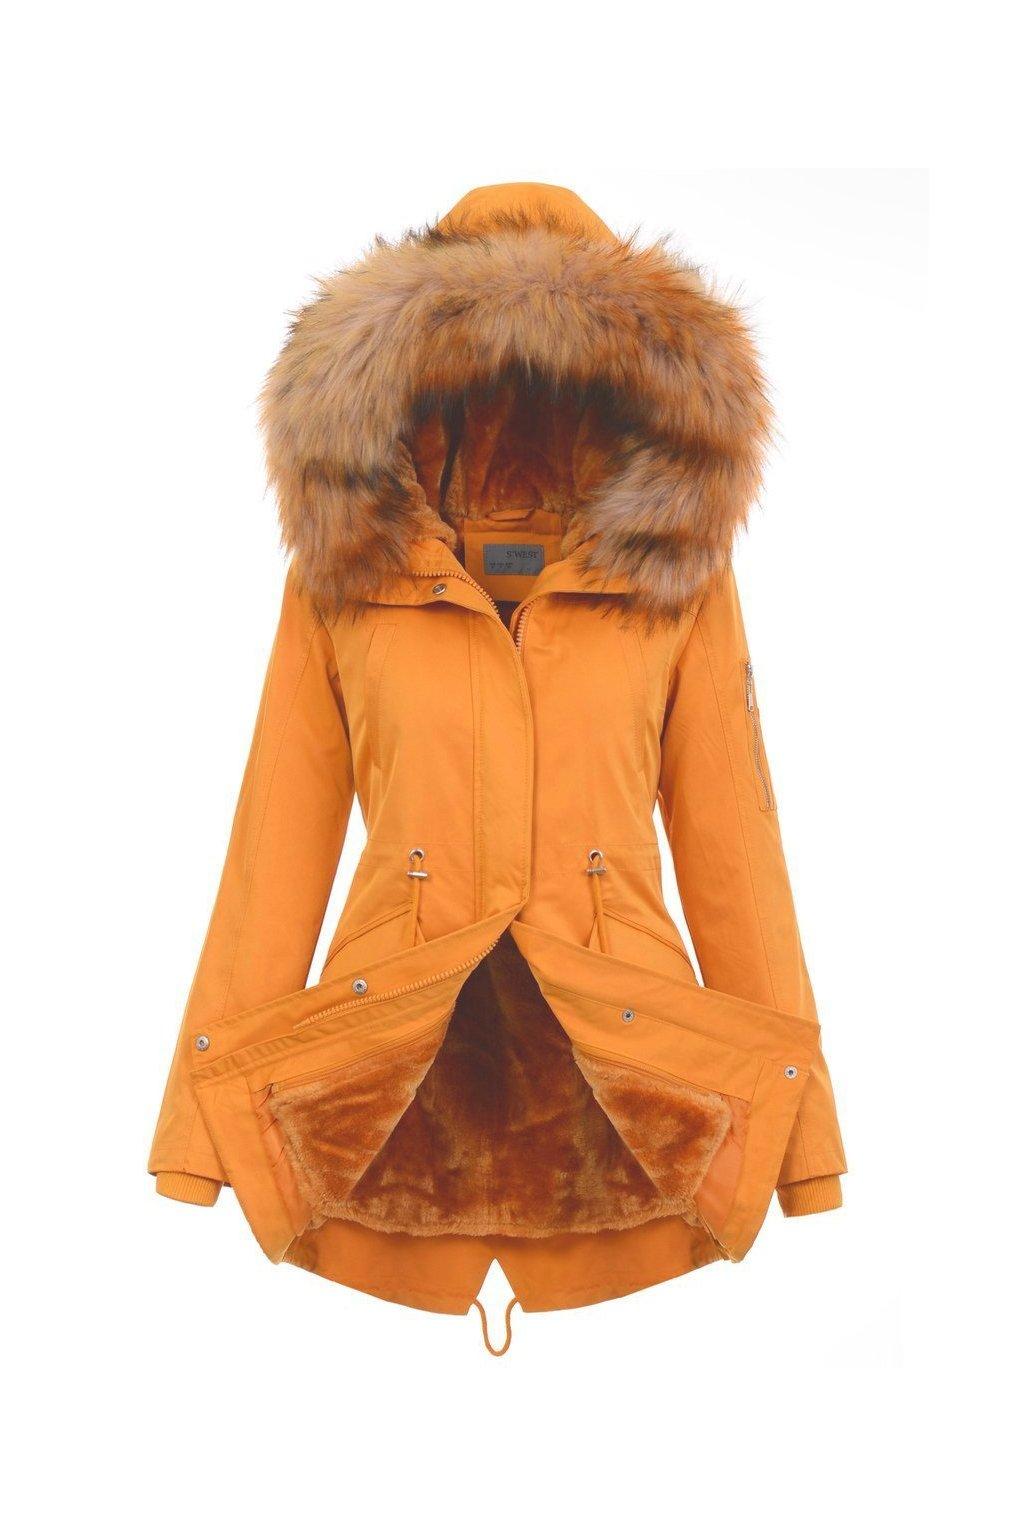 Dámska zimná bunda parka 2v1 4876 žltá